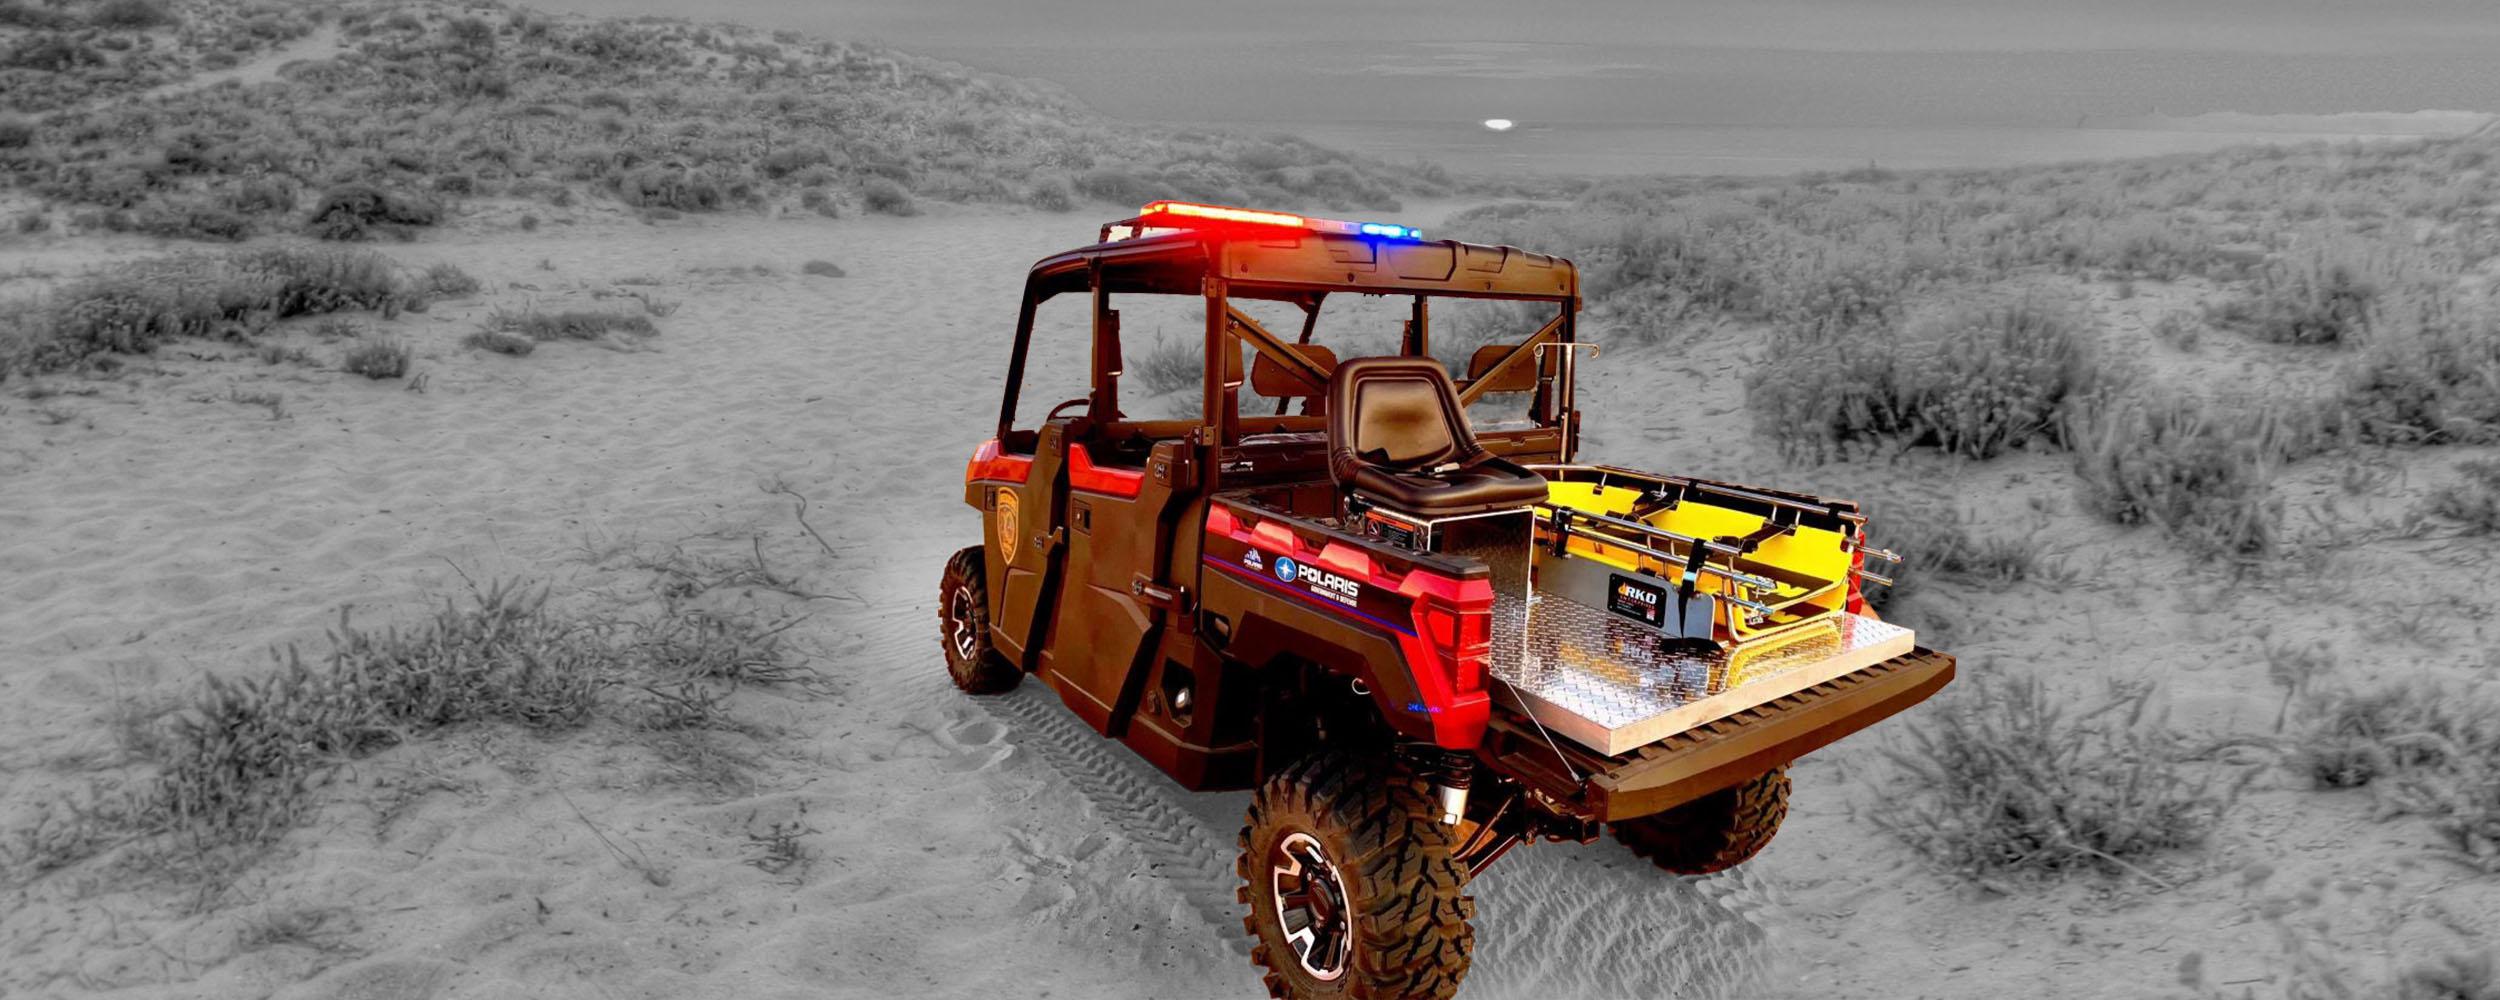 rescue-patrol-42500x1000